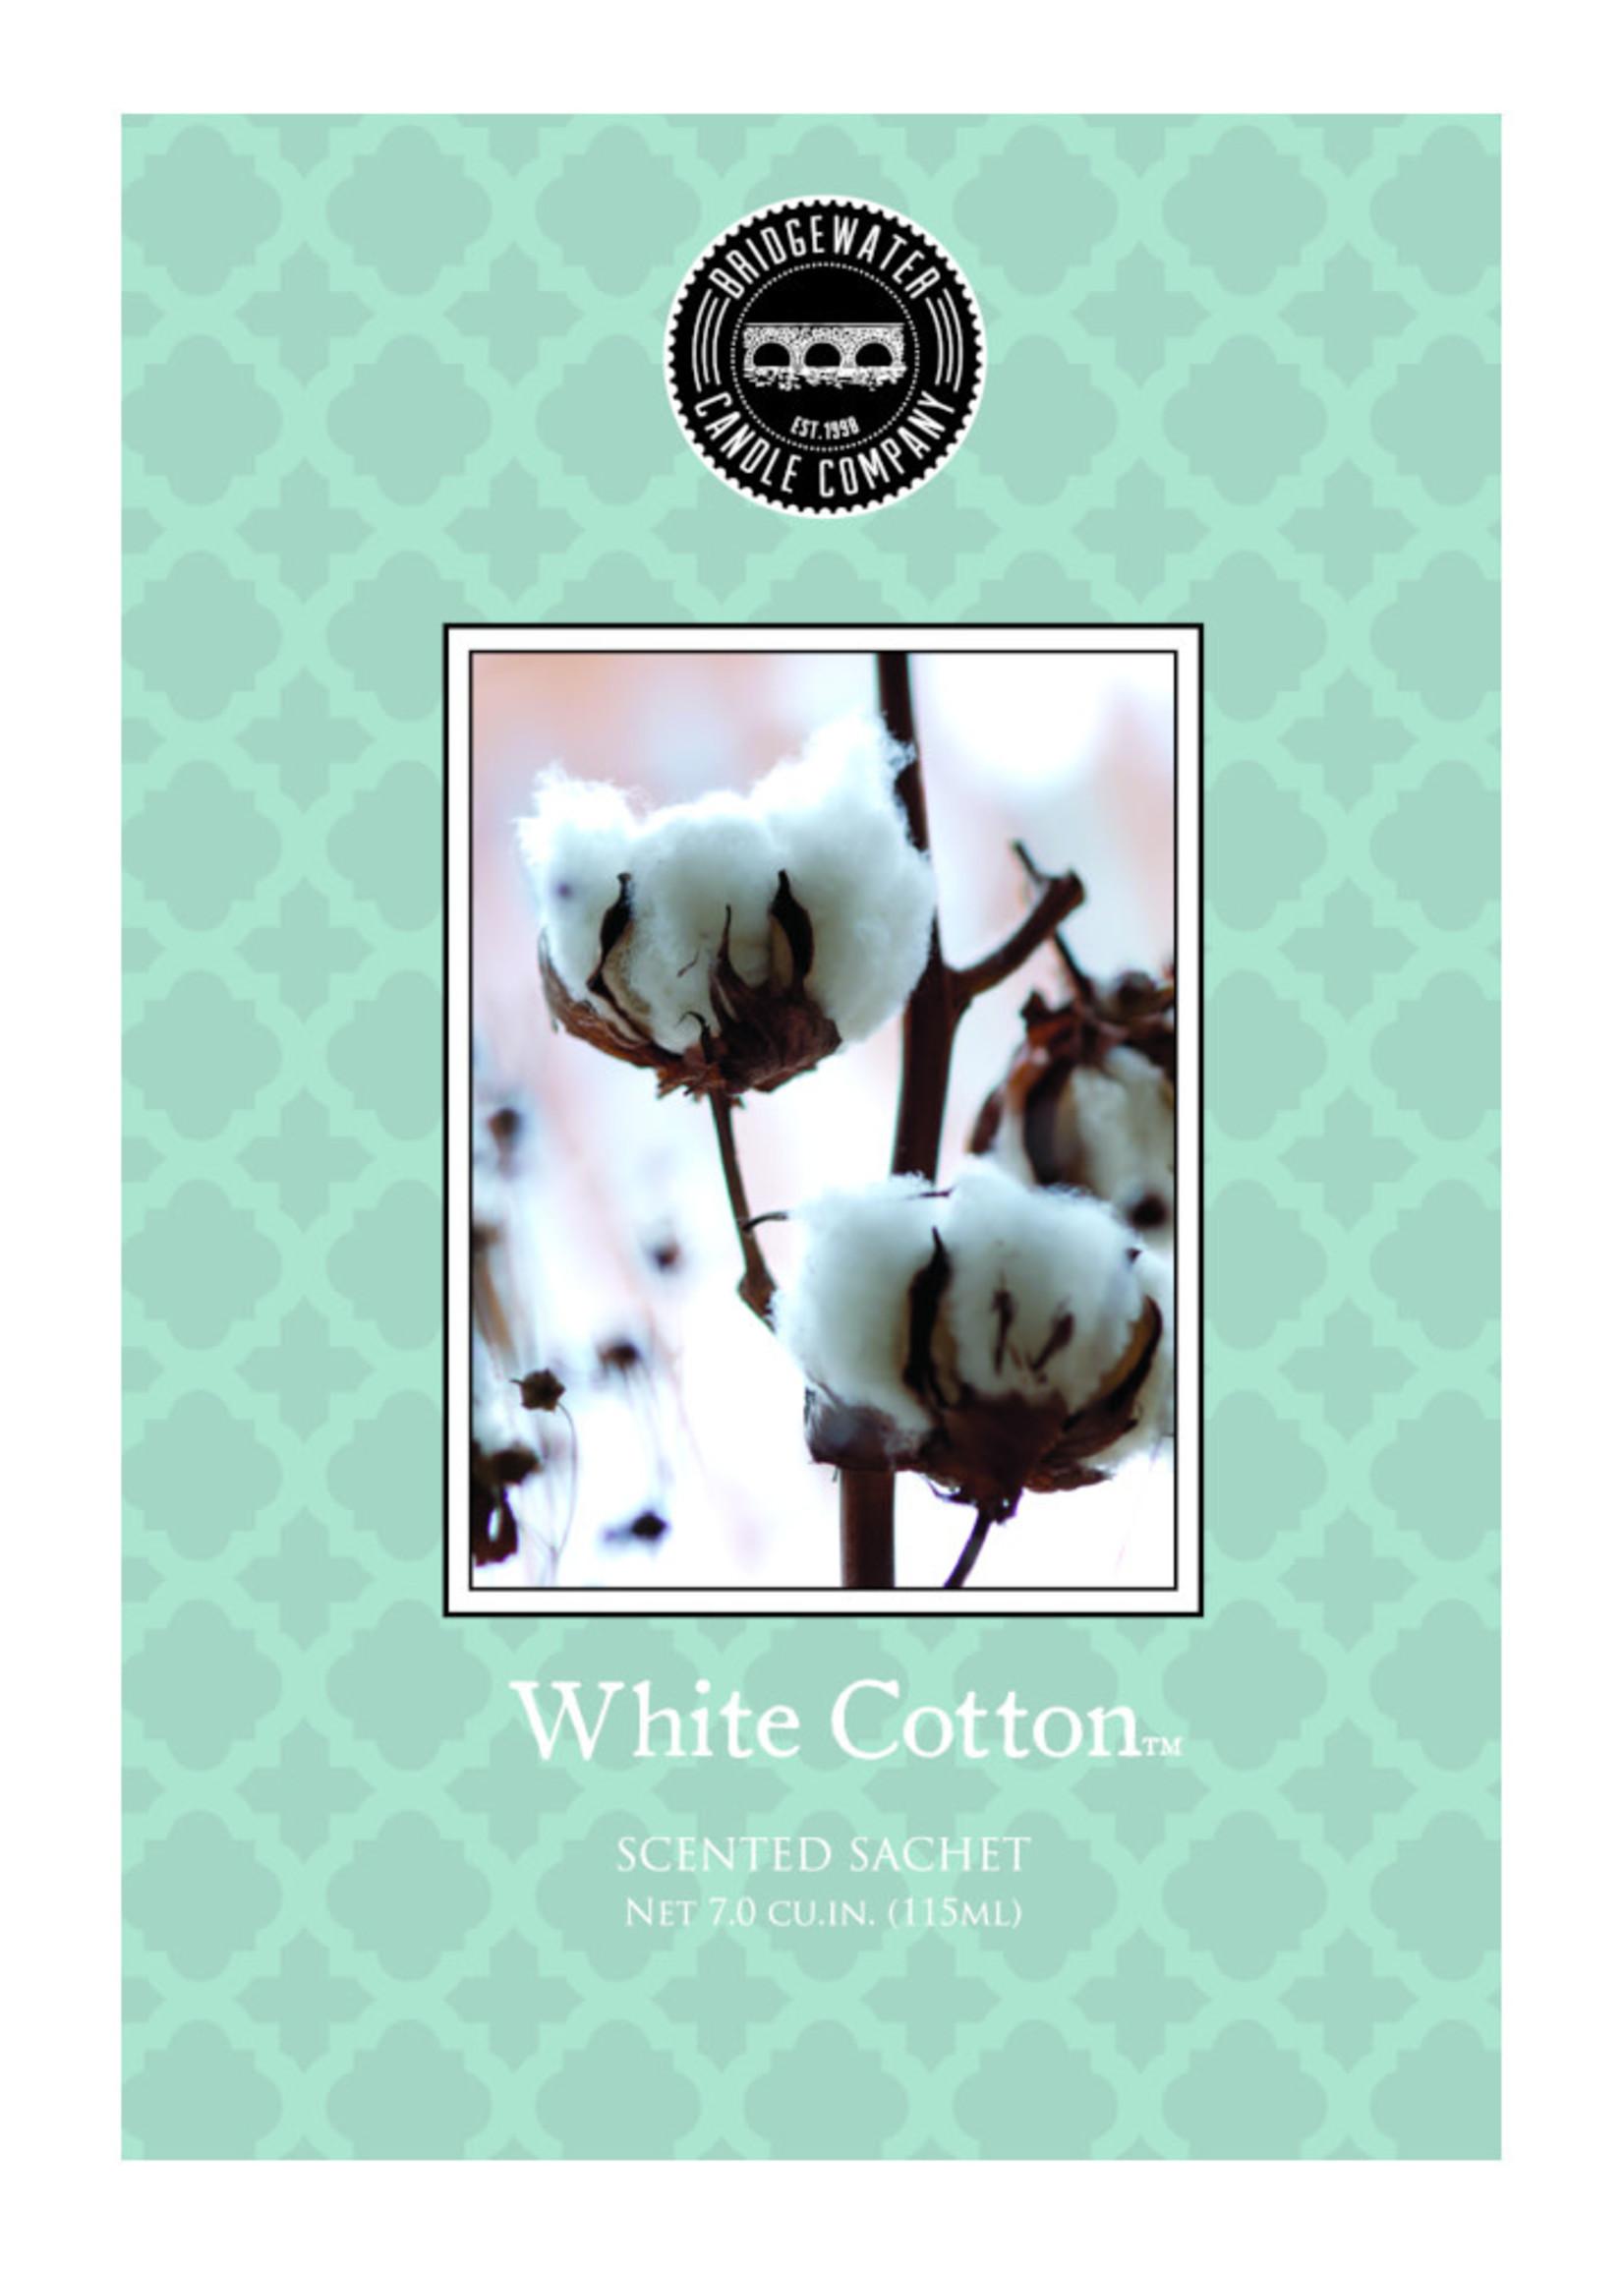 Scented Sachet White Cotton